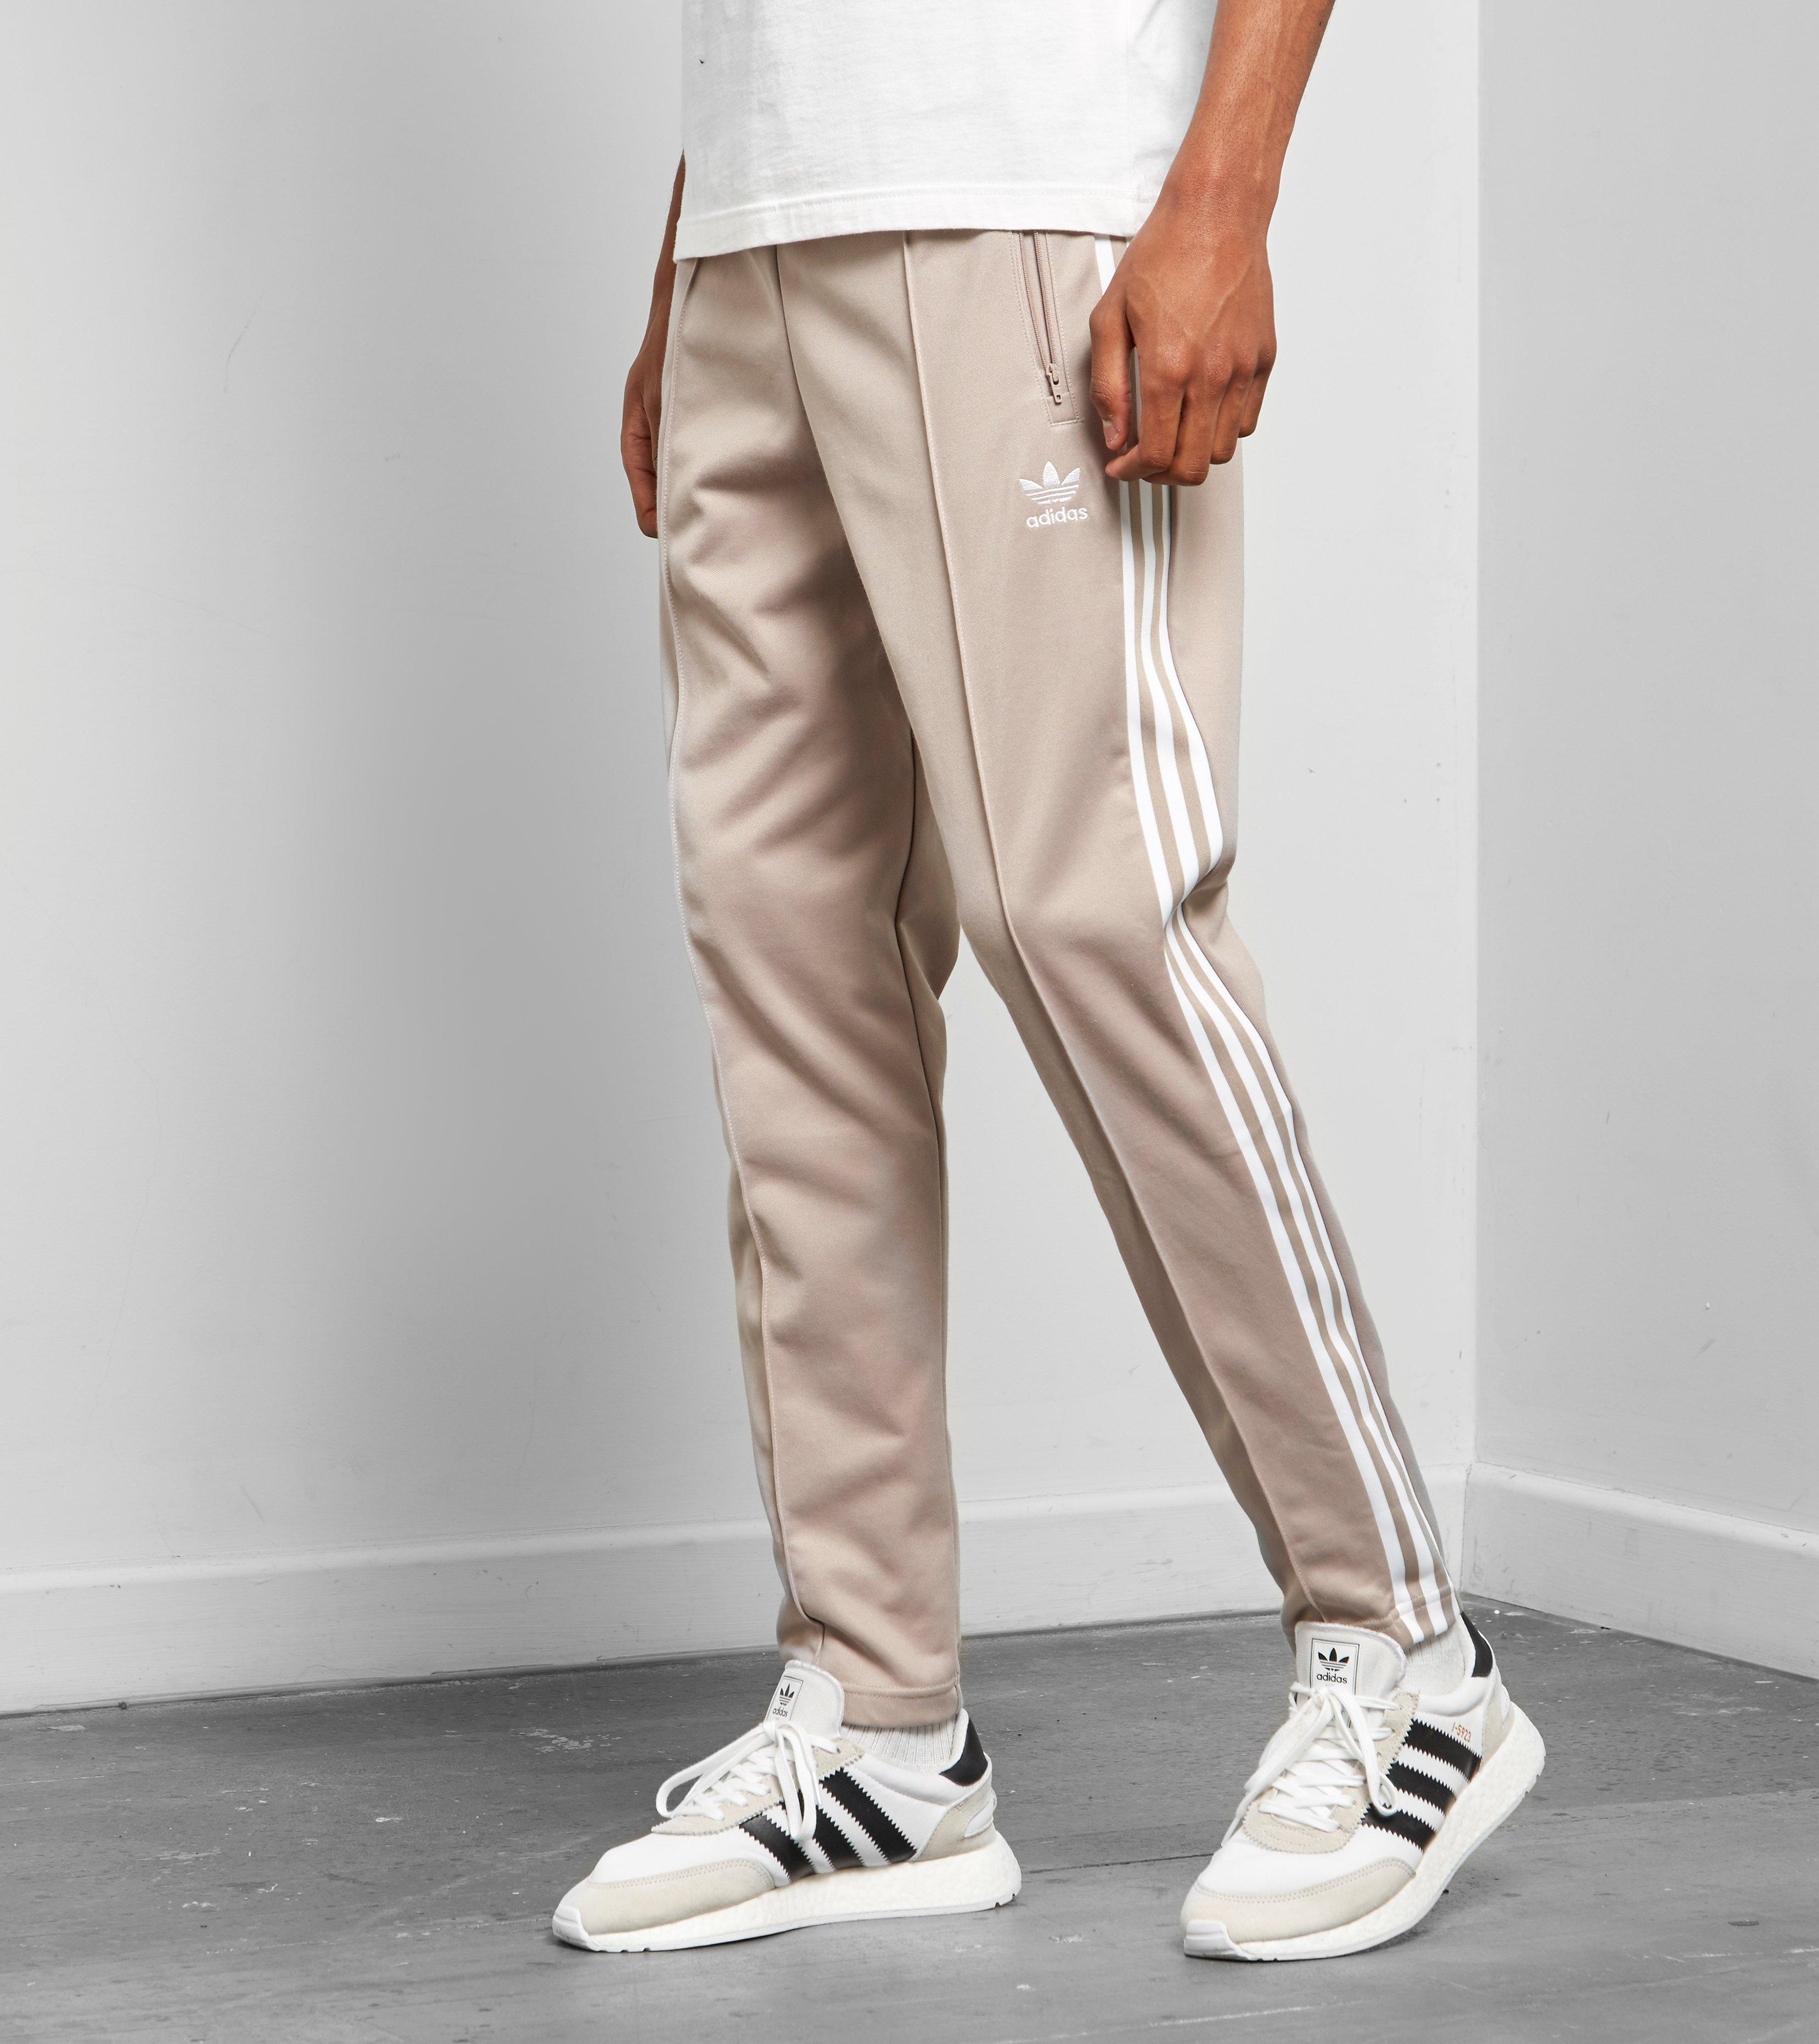 4d95ddfec2e Lyst - adidas Originals Beckenbauer Cuffed Track Pants in Gray for Men